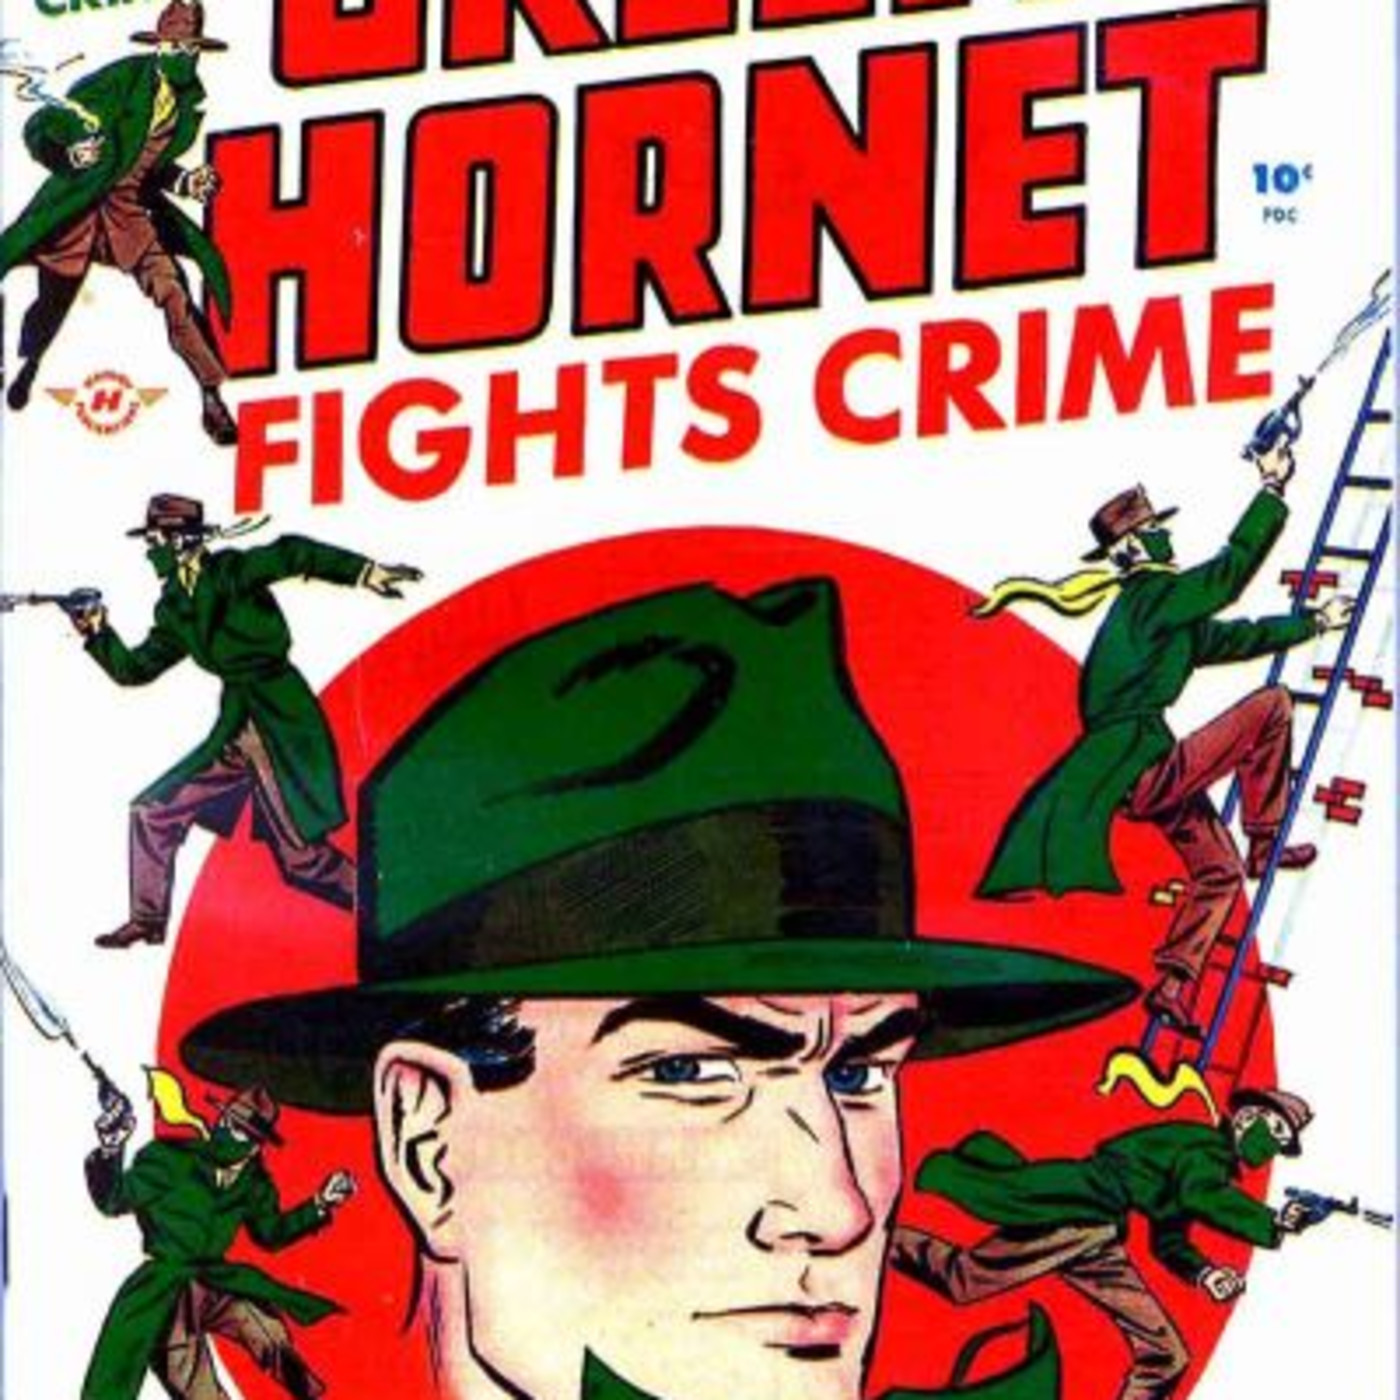 The Green Hornet - 00 - 450823TheUnexpectedMeeting